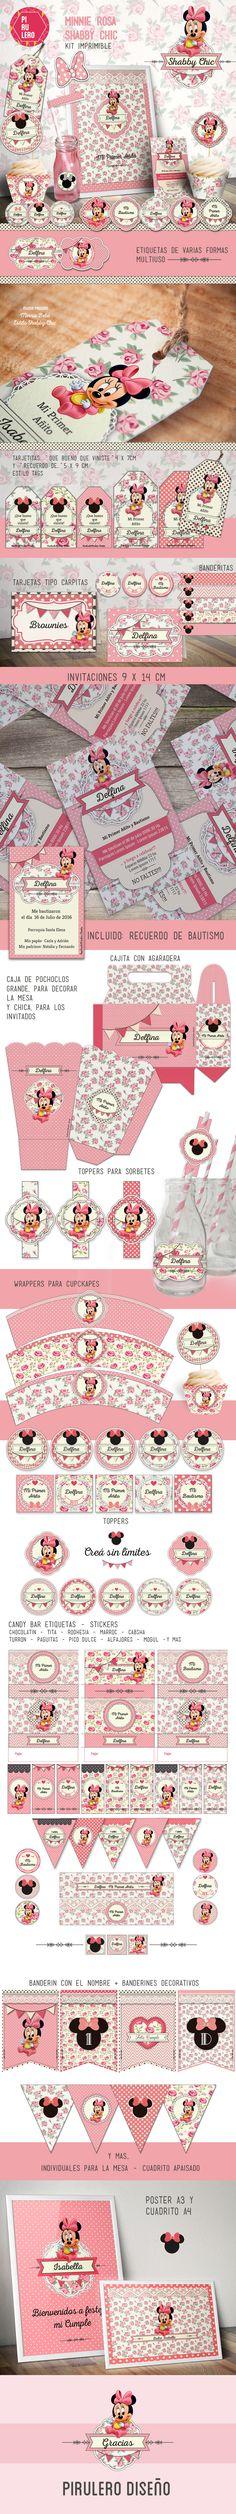 Kit imprimible de Pirulero Minnie Bebé rosa Shabby Chic #Printable #kitimprimible #minnieBebe #minnie #ShabbyChic